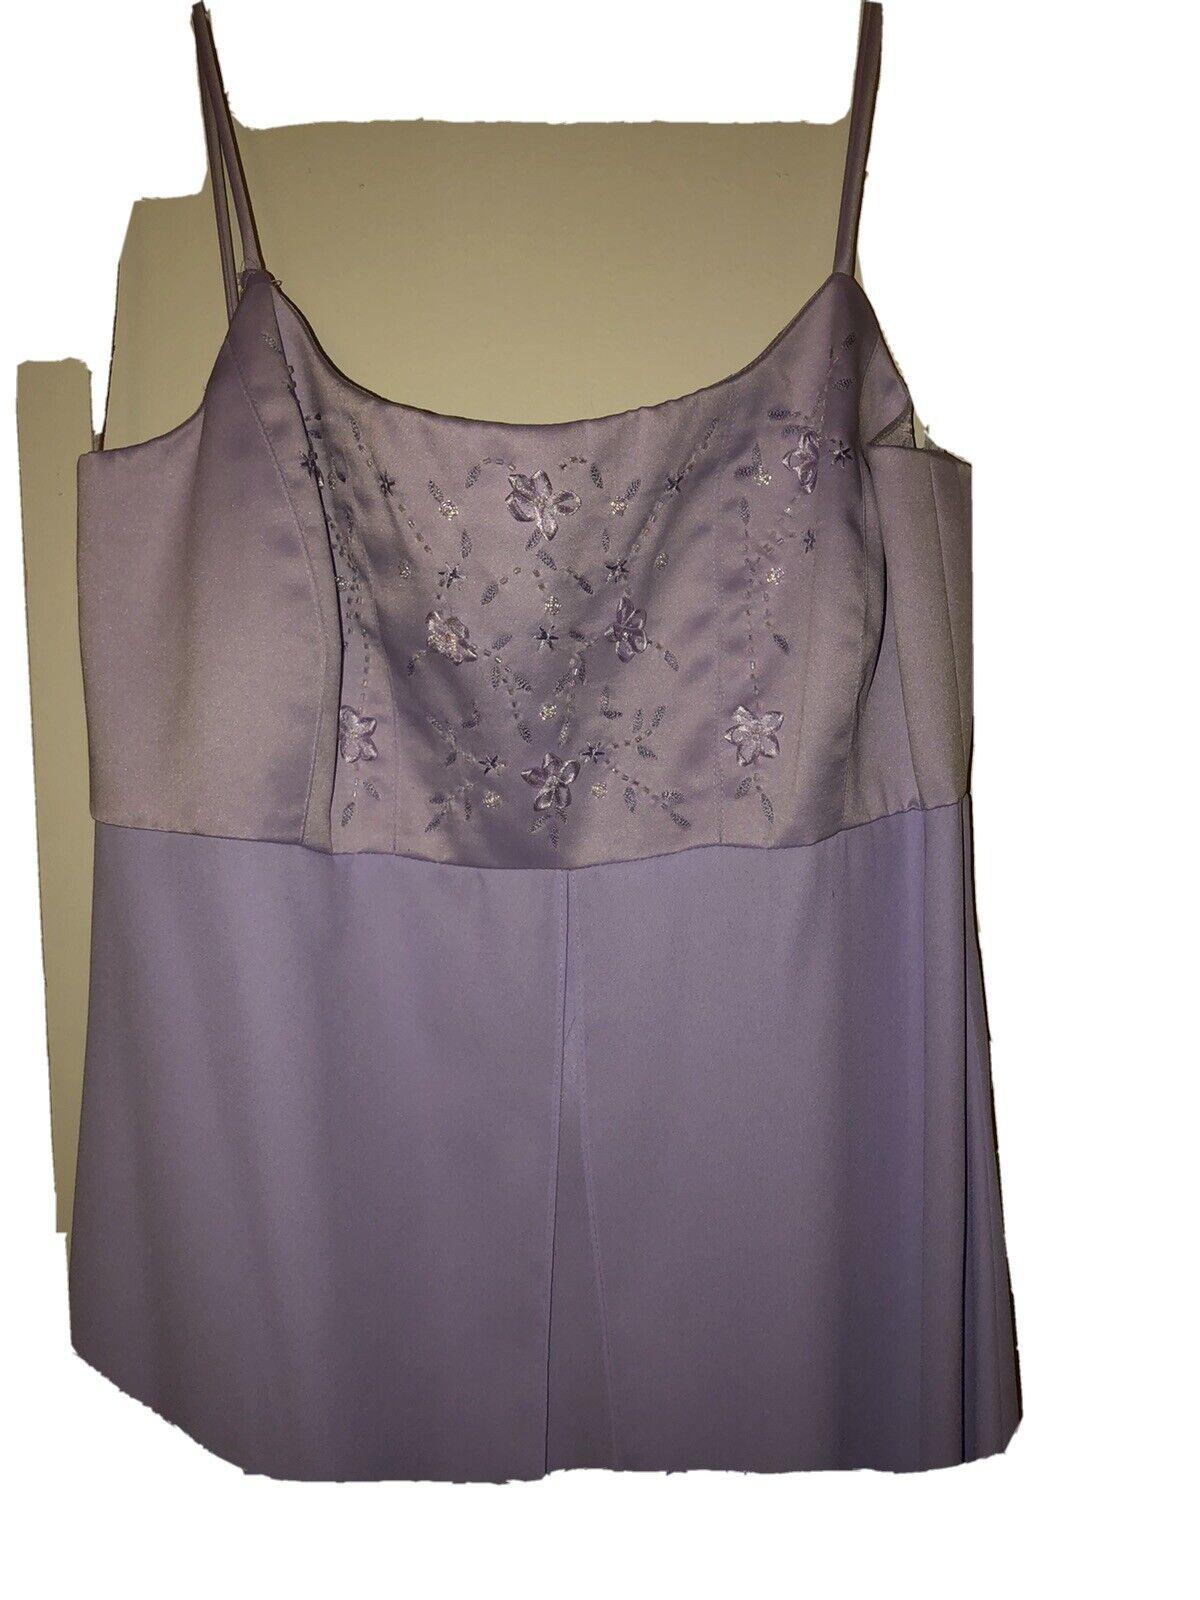 VINTAGE MICHAELANGELO Lavender Evening Prom Wedding Formal Gown / Dress Size 8